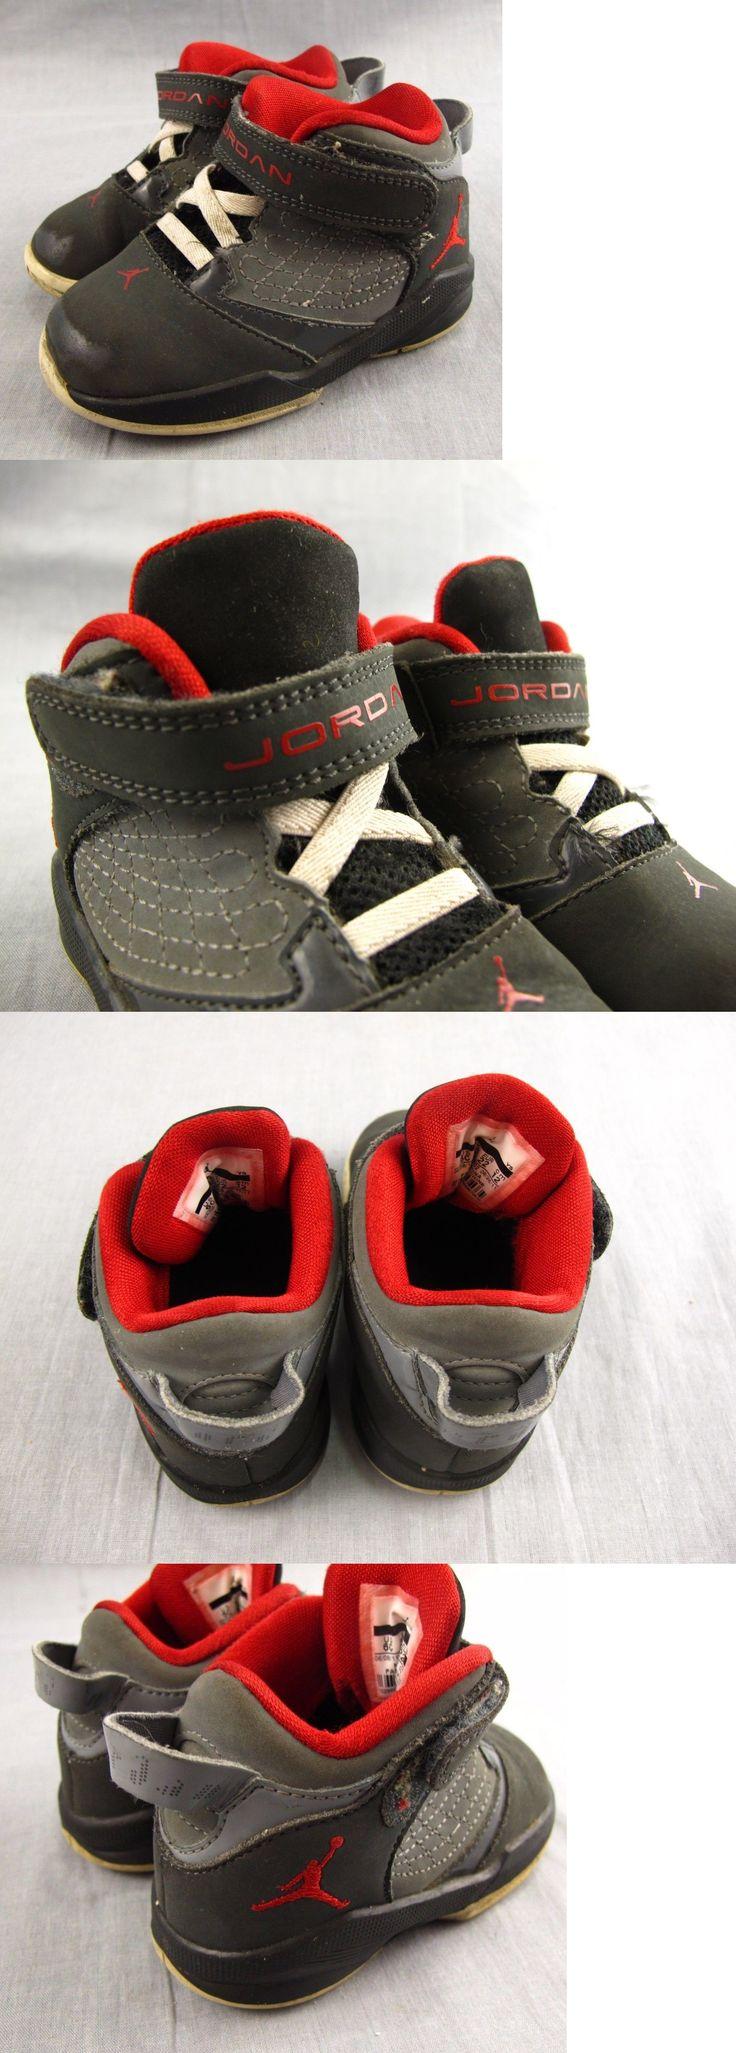 Michael Jordan Baby Clothing: Michael Jordan New School Toddler Basketball Shoes 6C Baby Jumpman Sneakers -> BUY IT NOW ONLY: $14.85 on eBay!